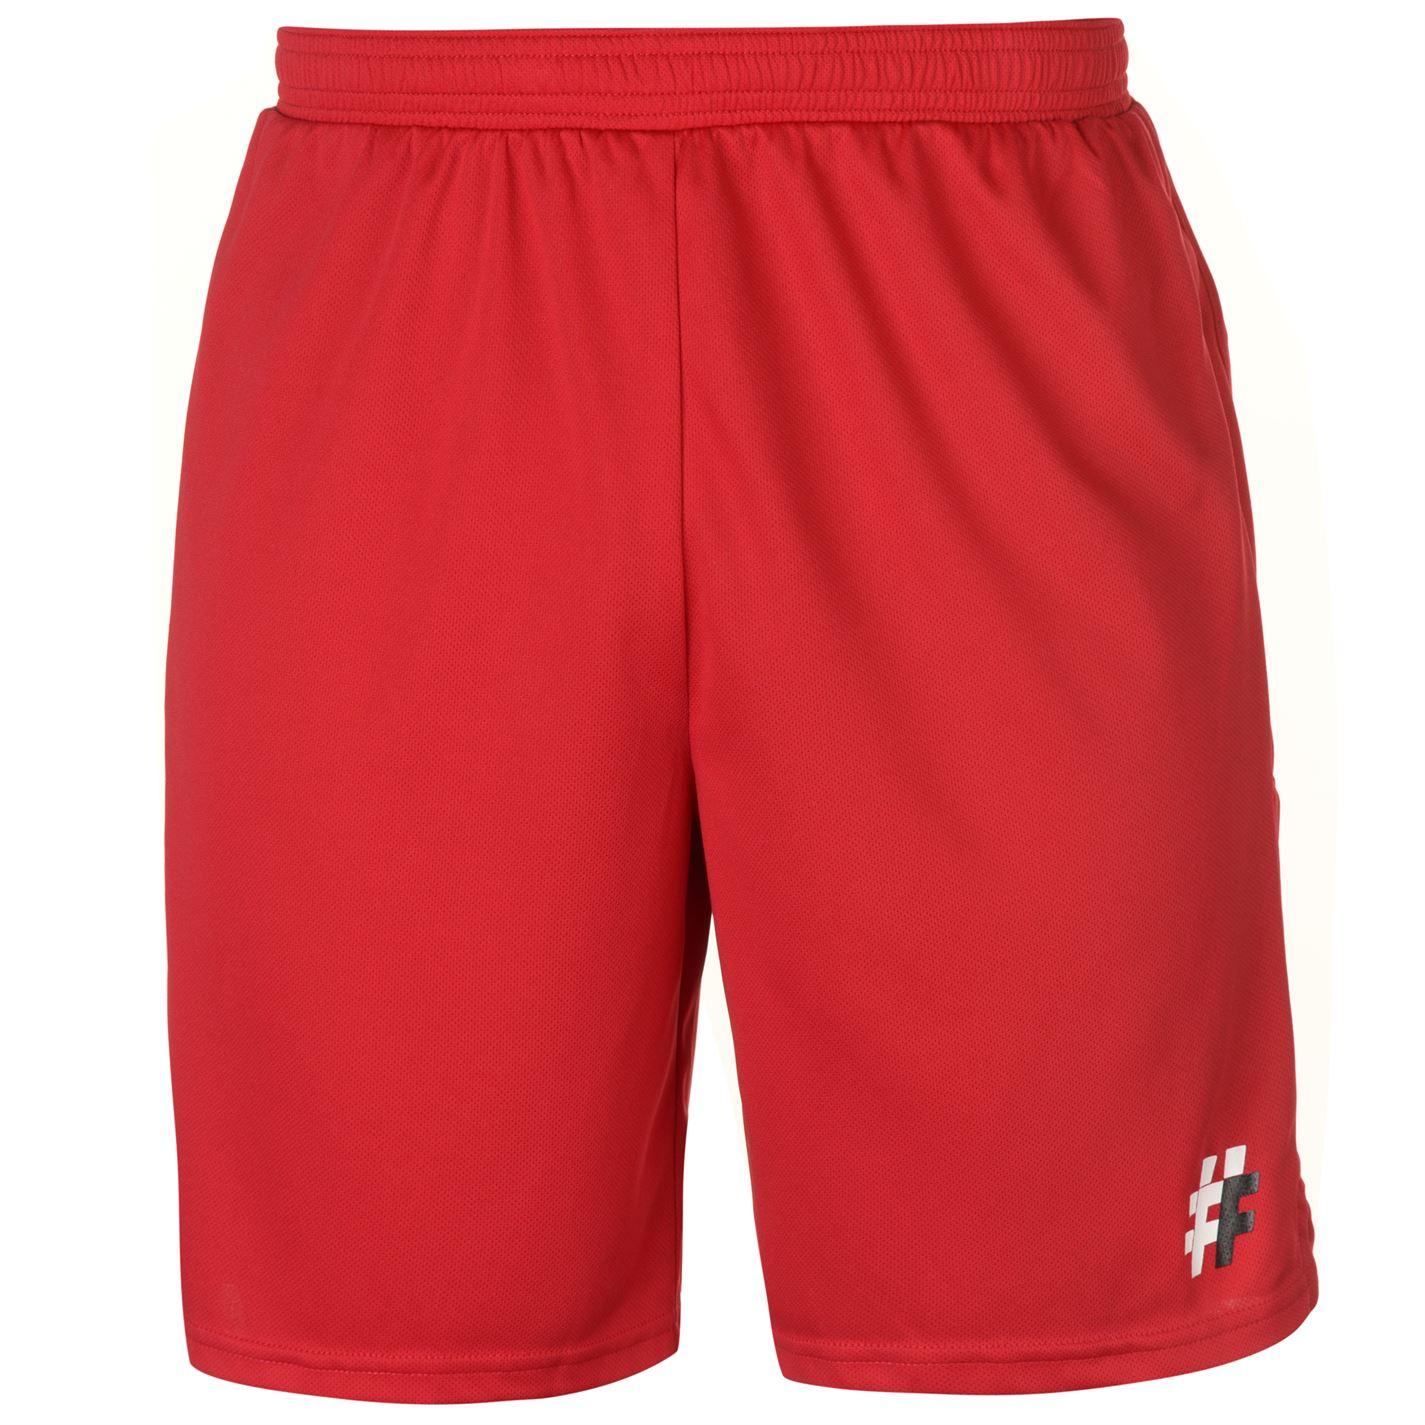 Five Stadium Shorts Mens